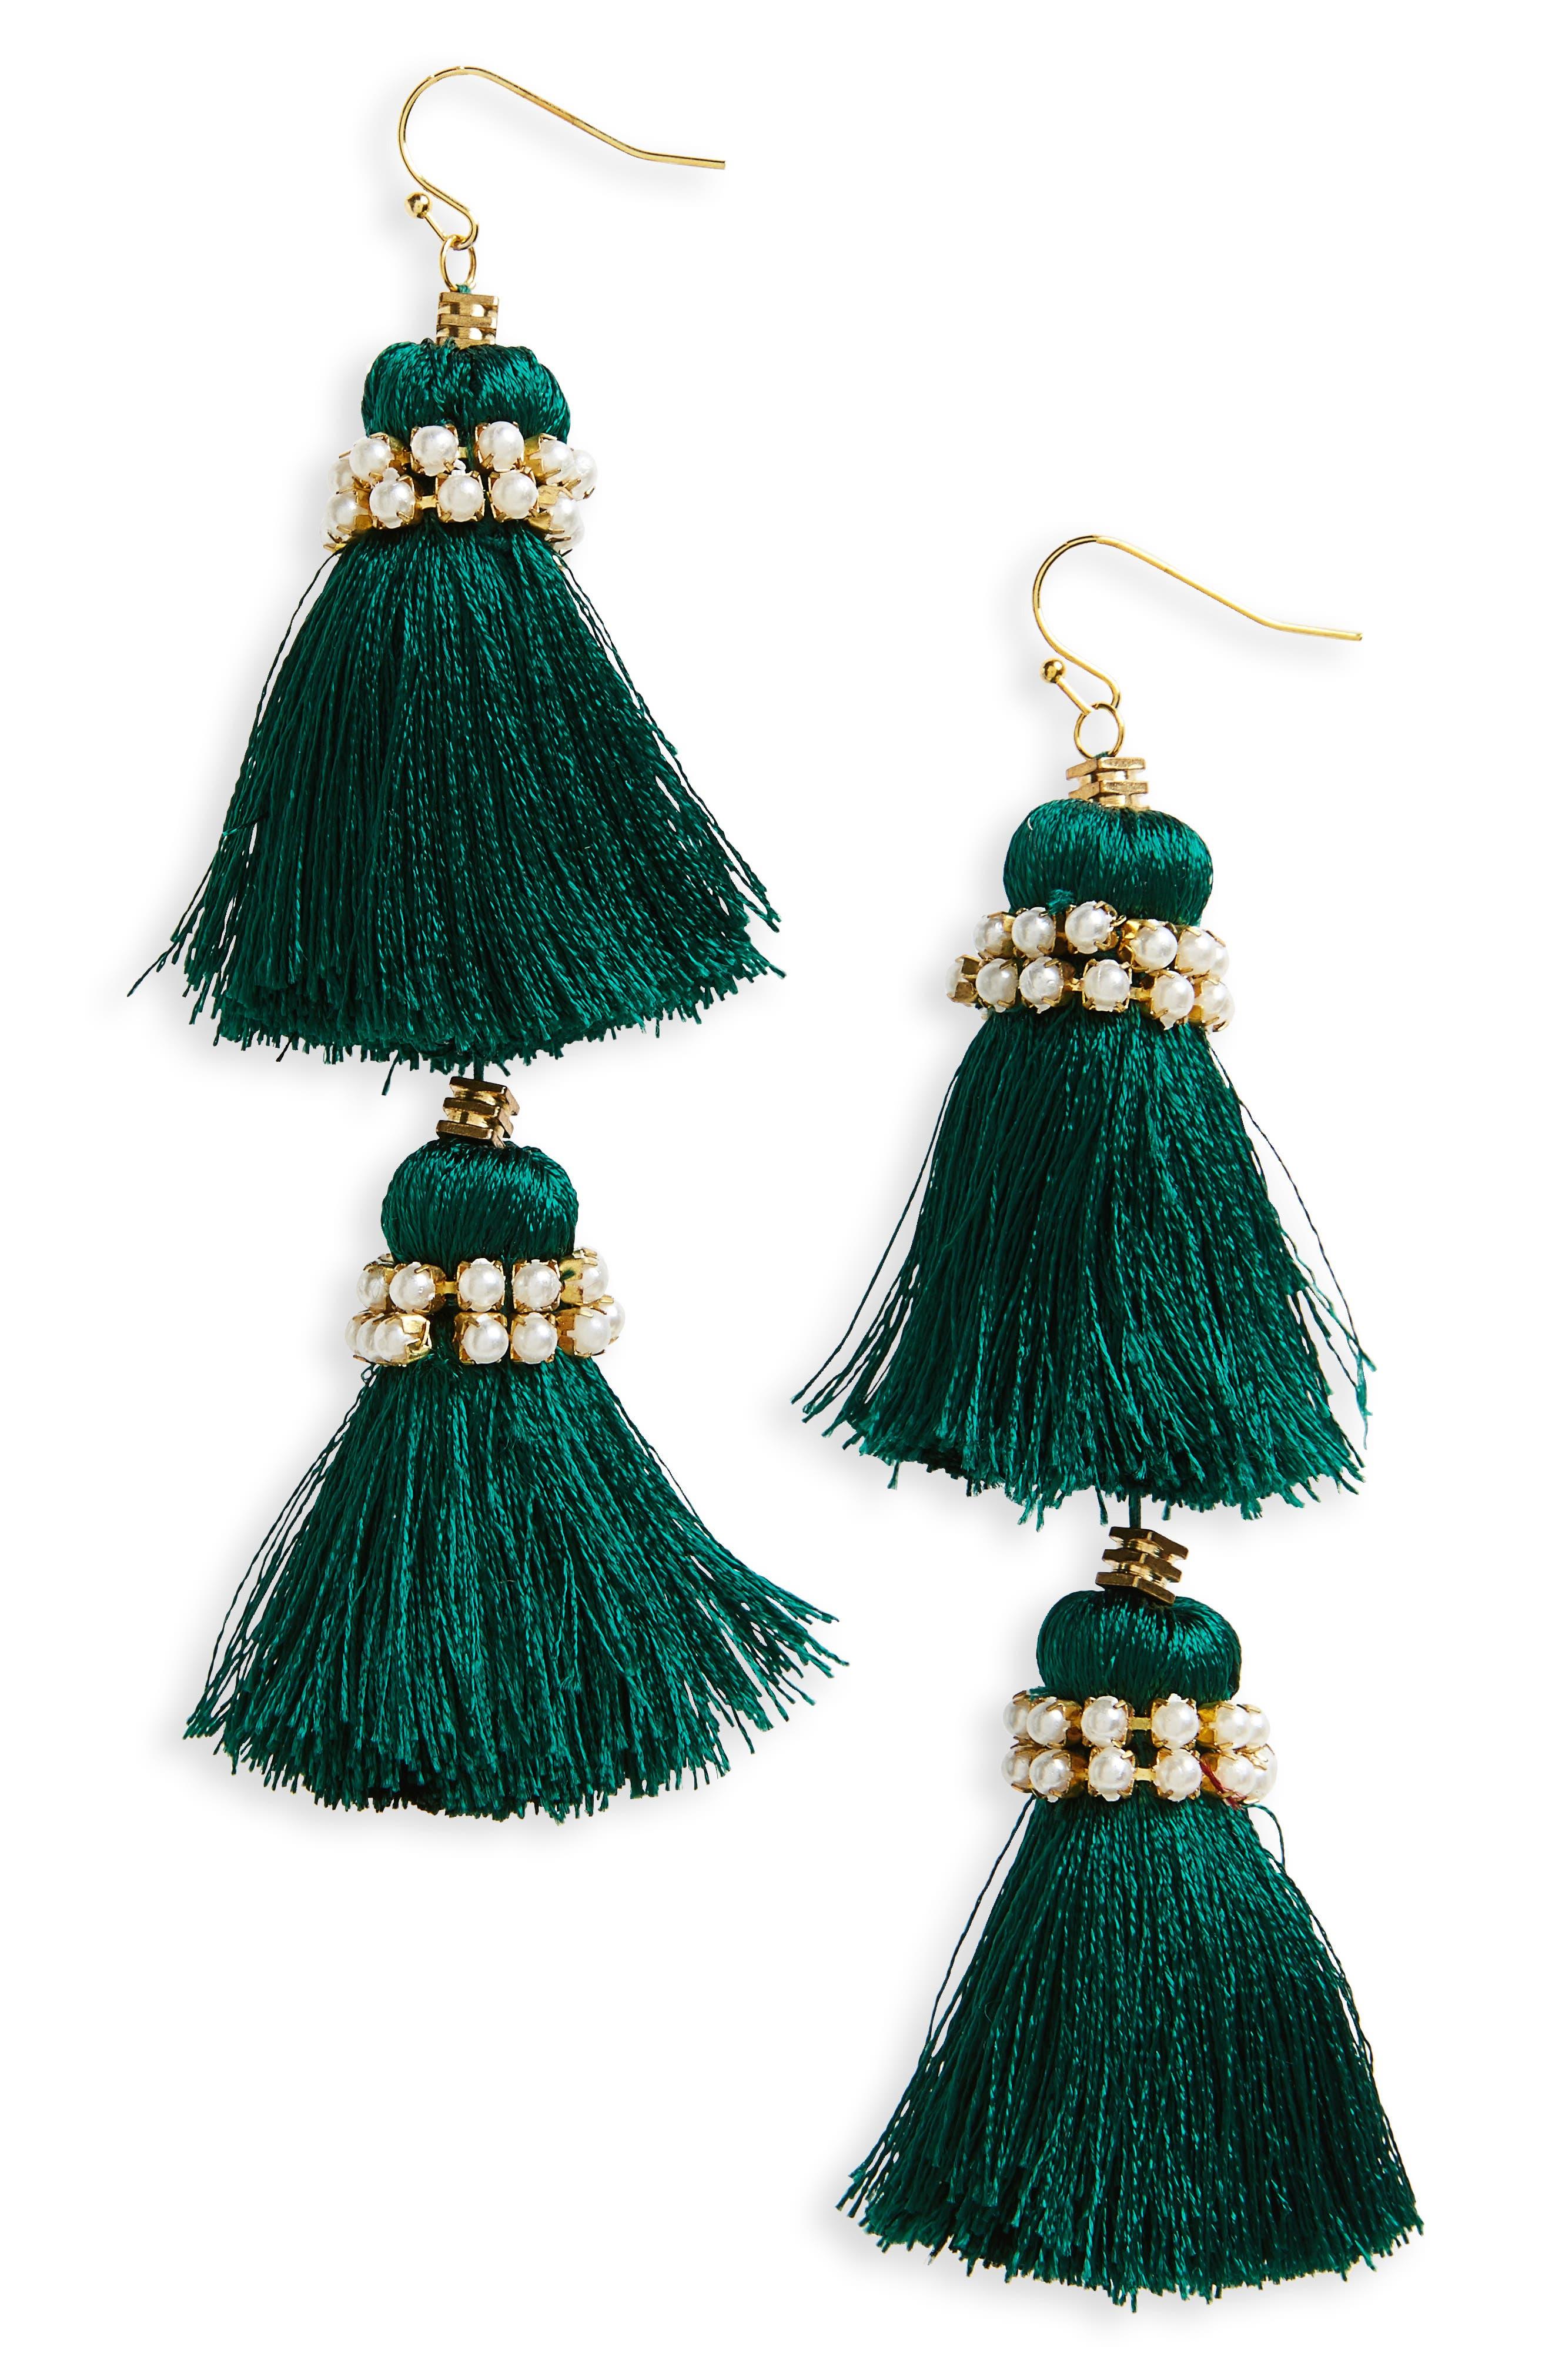 Alternate Image 1 Selected - New Friends Colony Imitation Pearl & Tassel Earrings